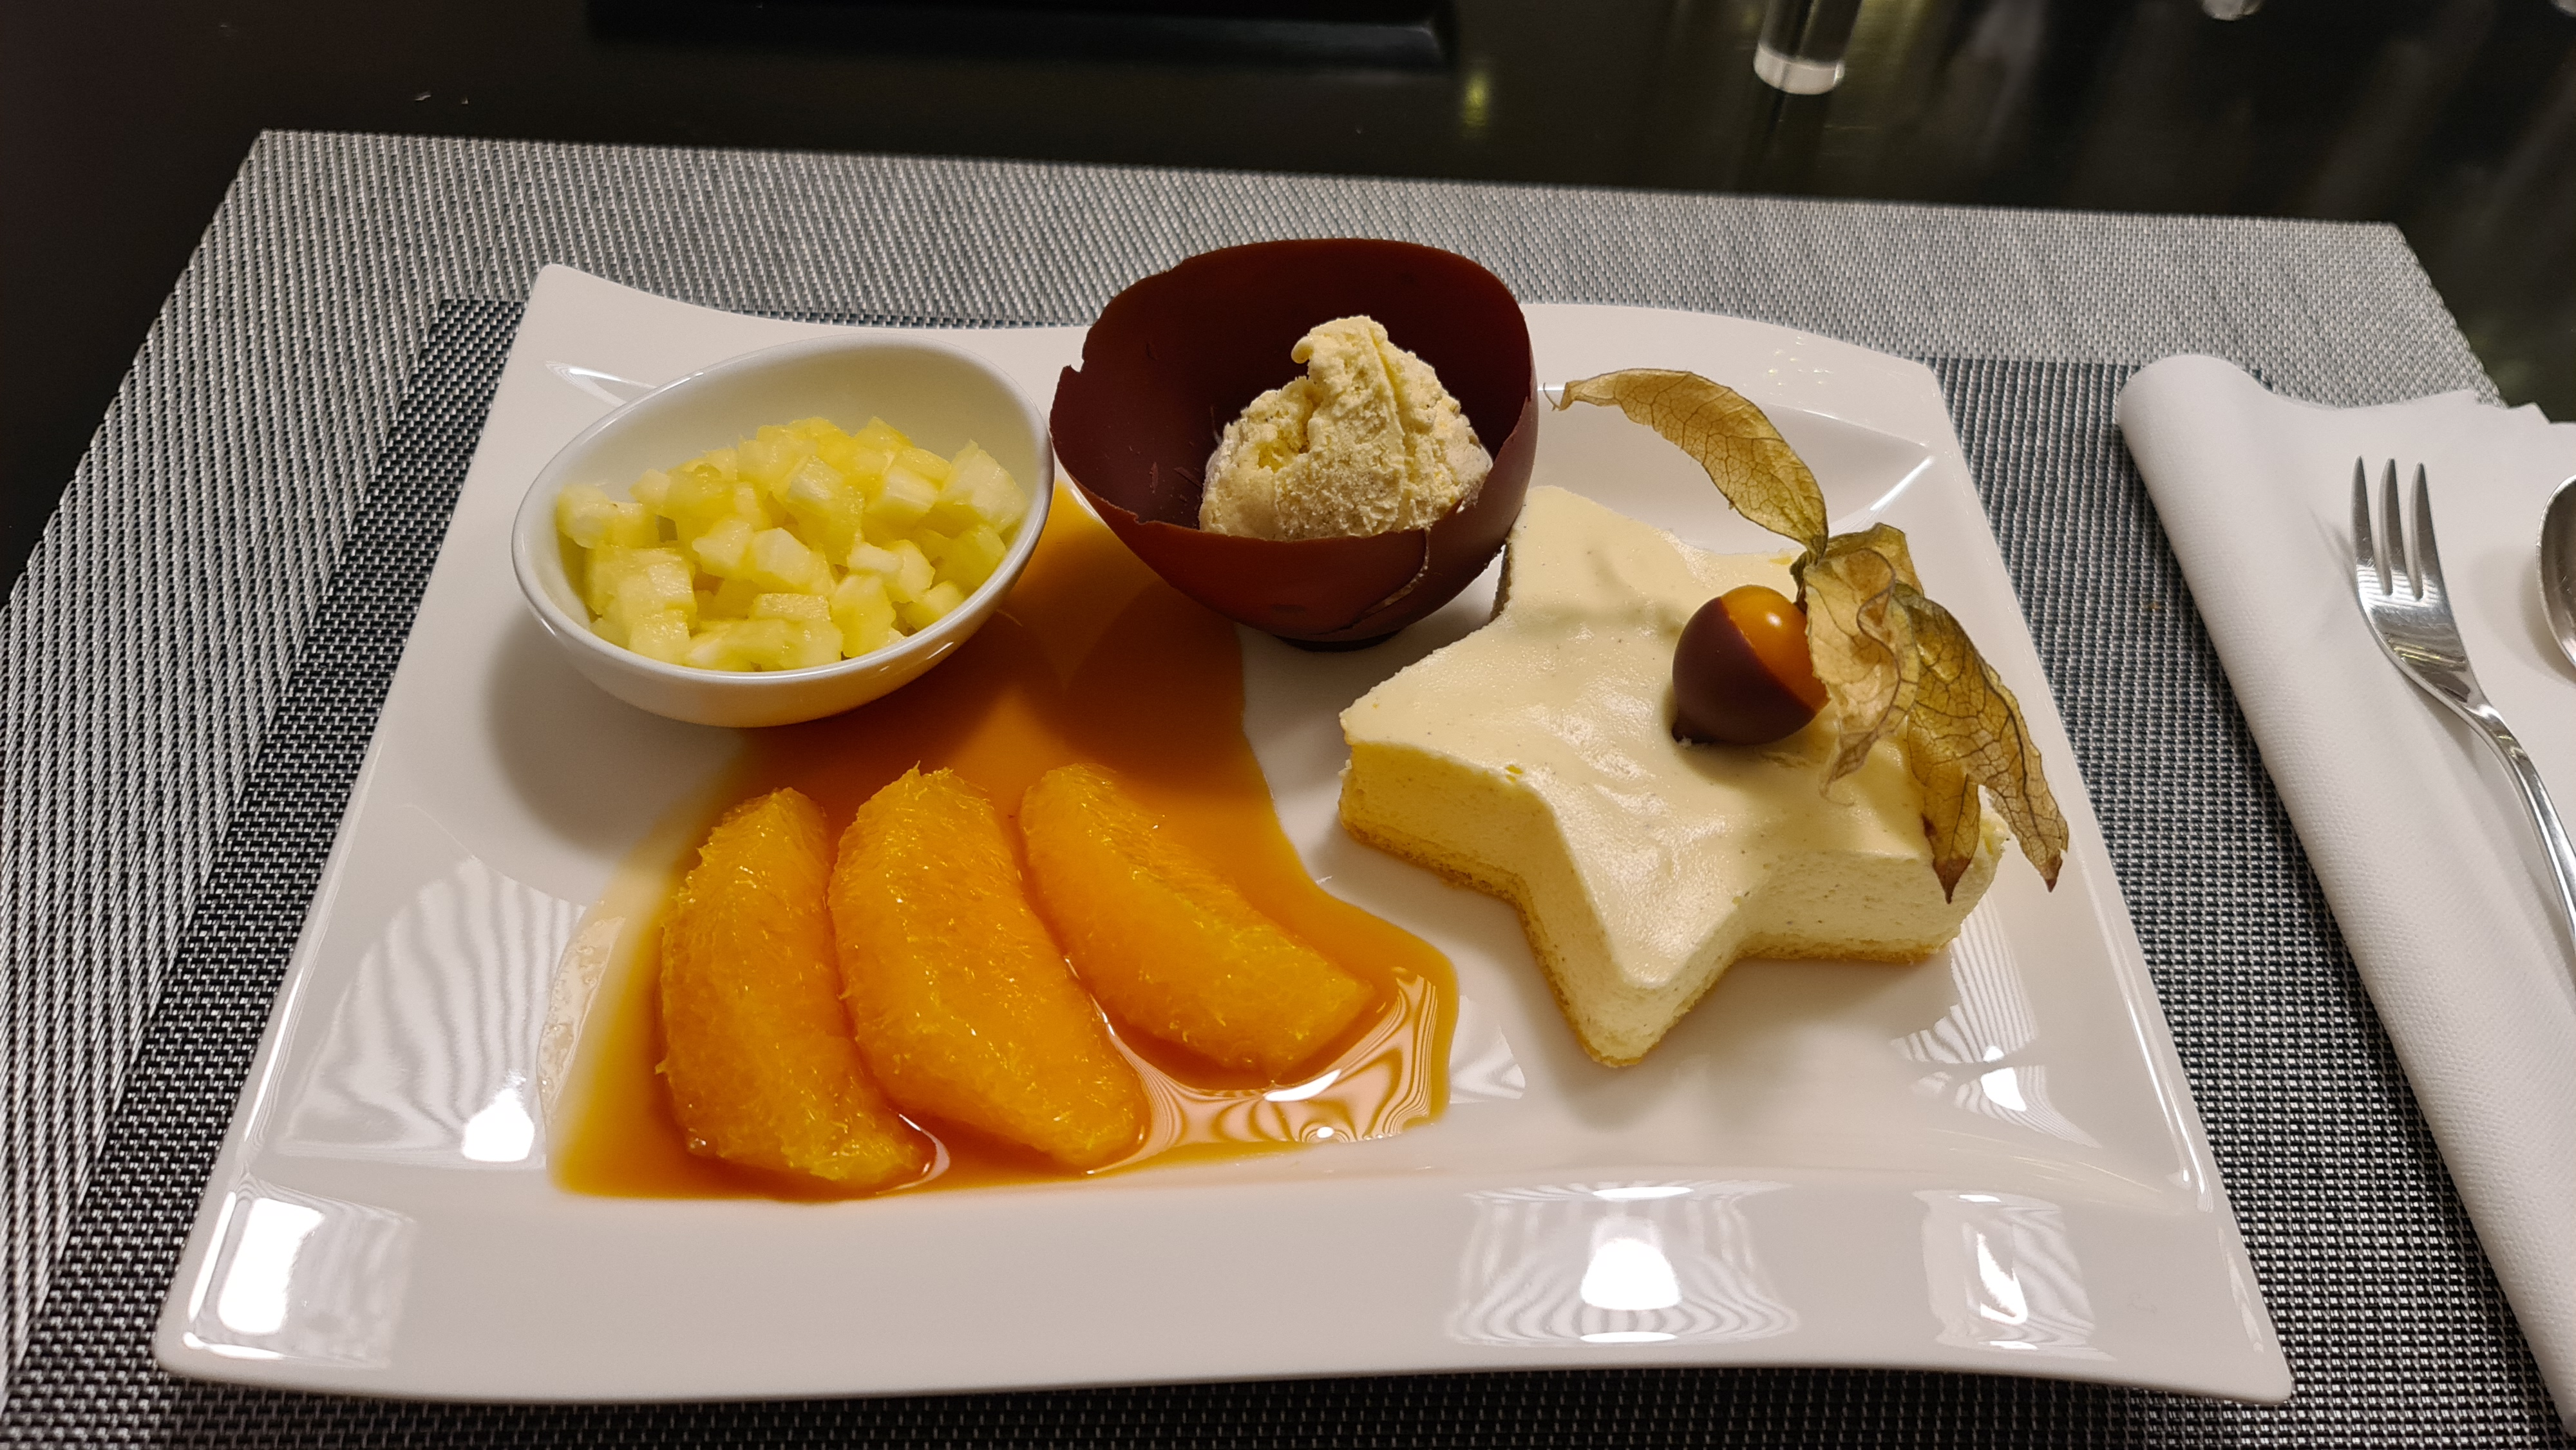 https://foodloader.net/Holz_2020-12-26_Dessert.jpg